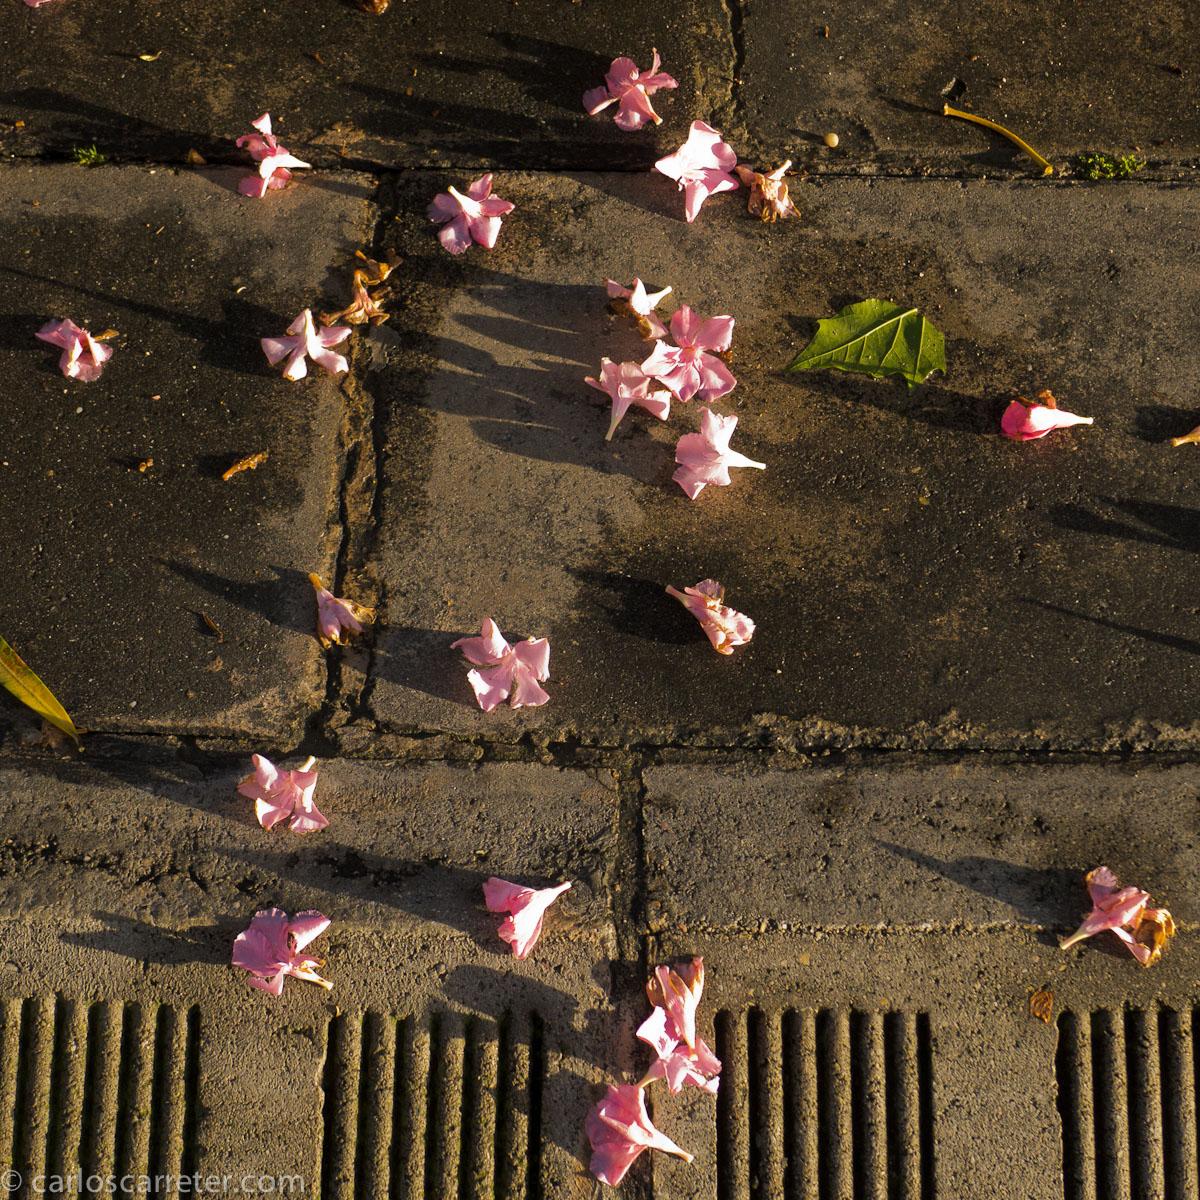 Flores caídas